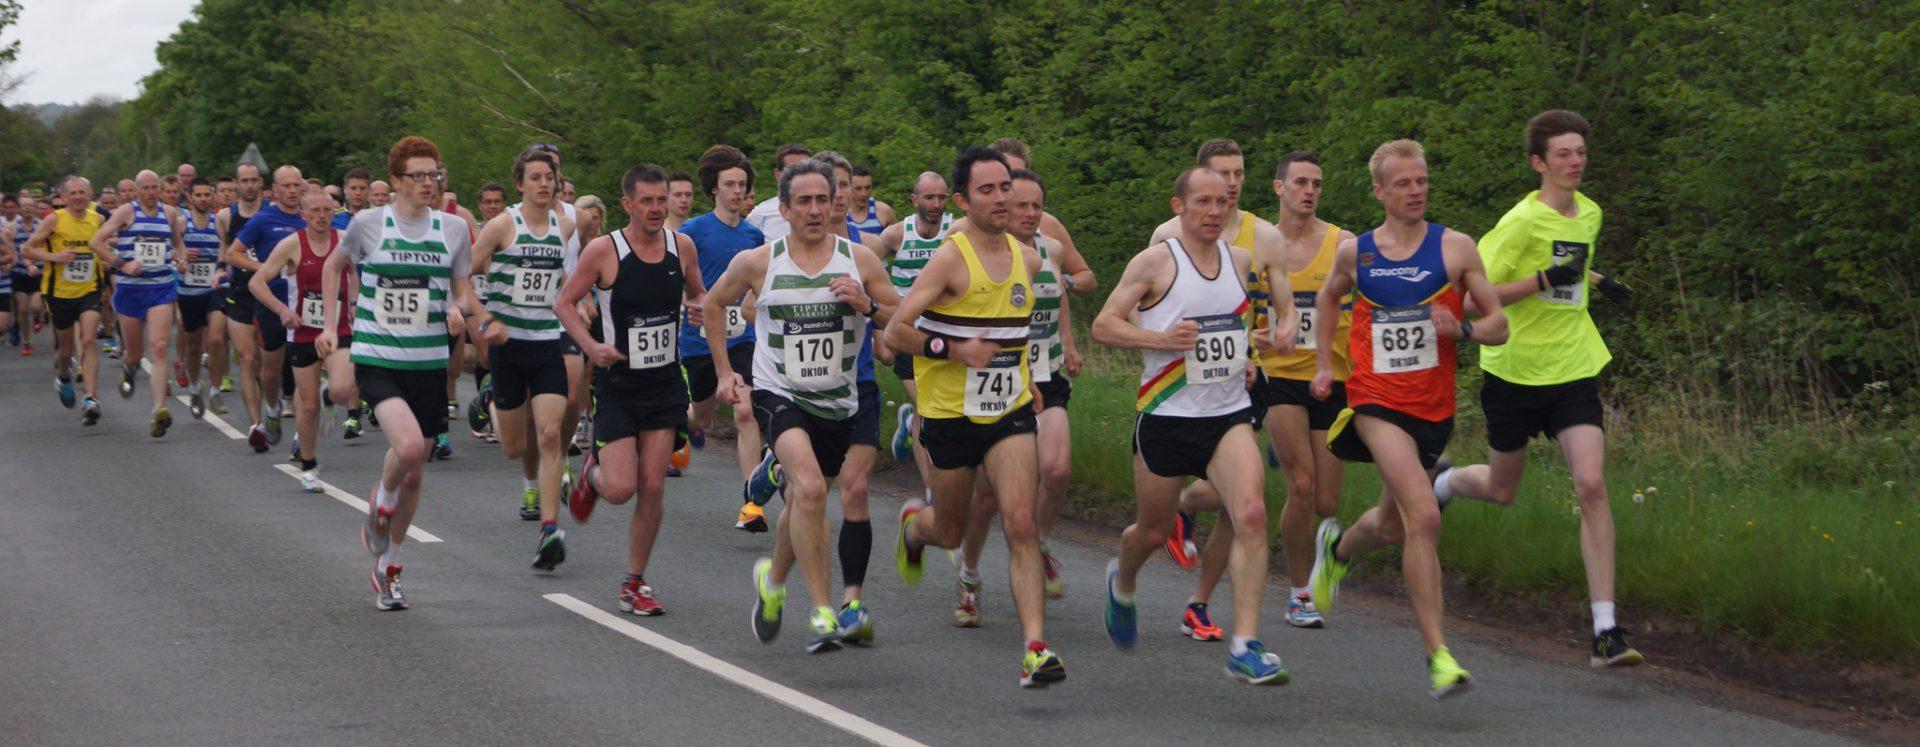 DK Running Club